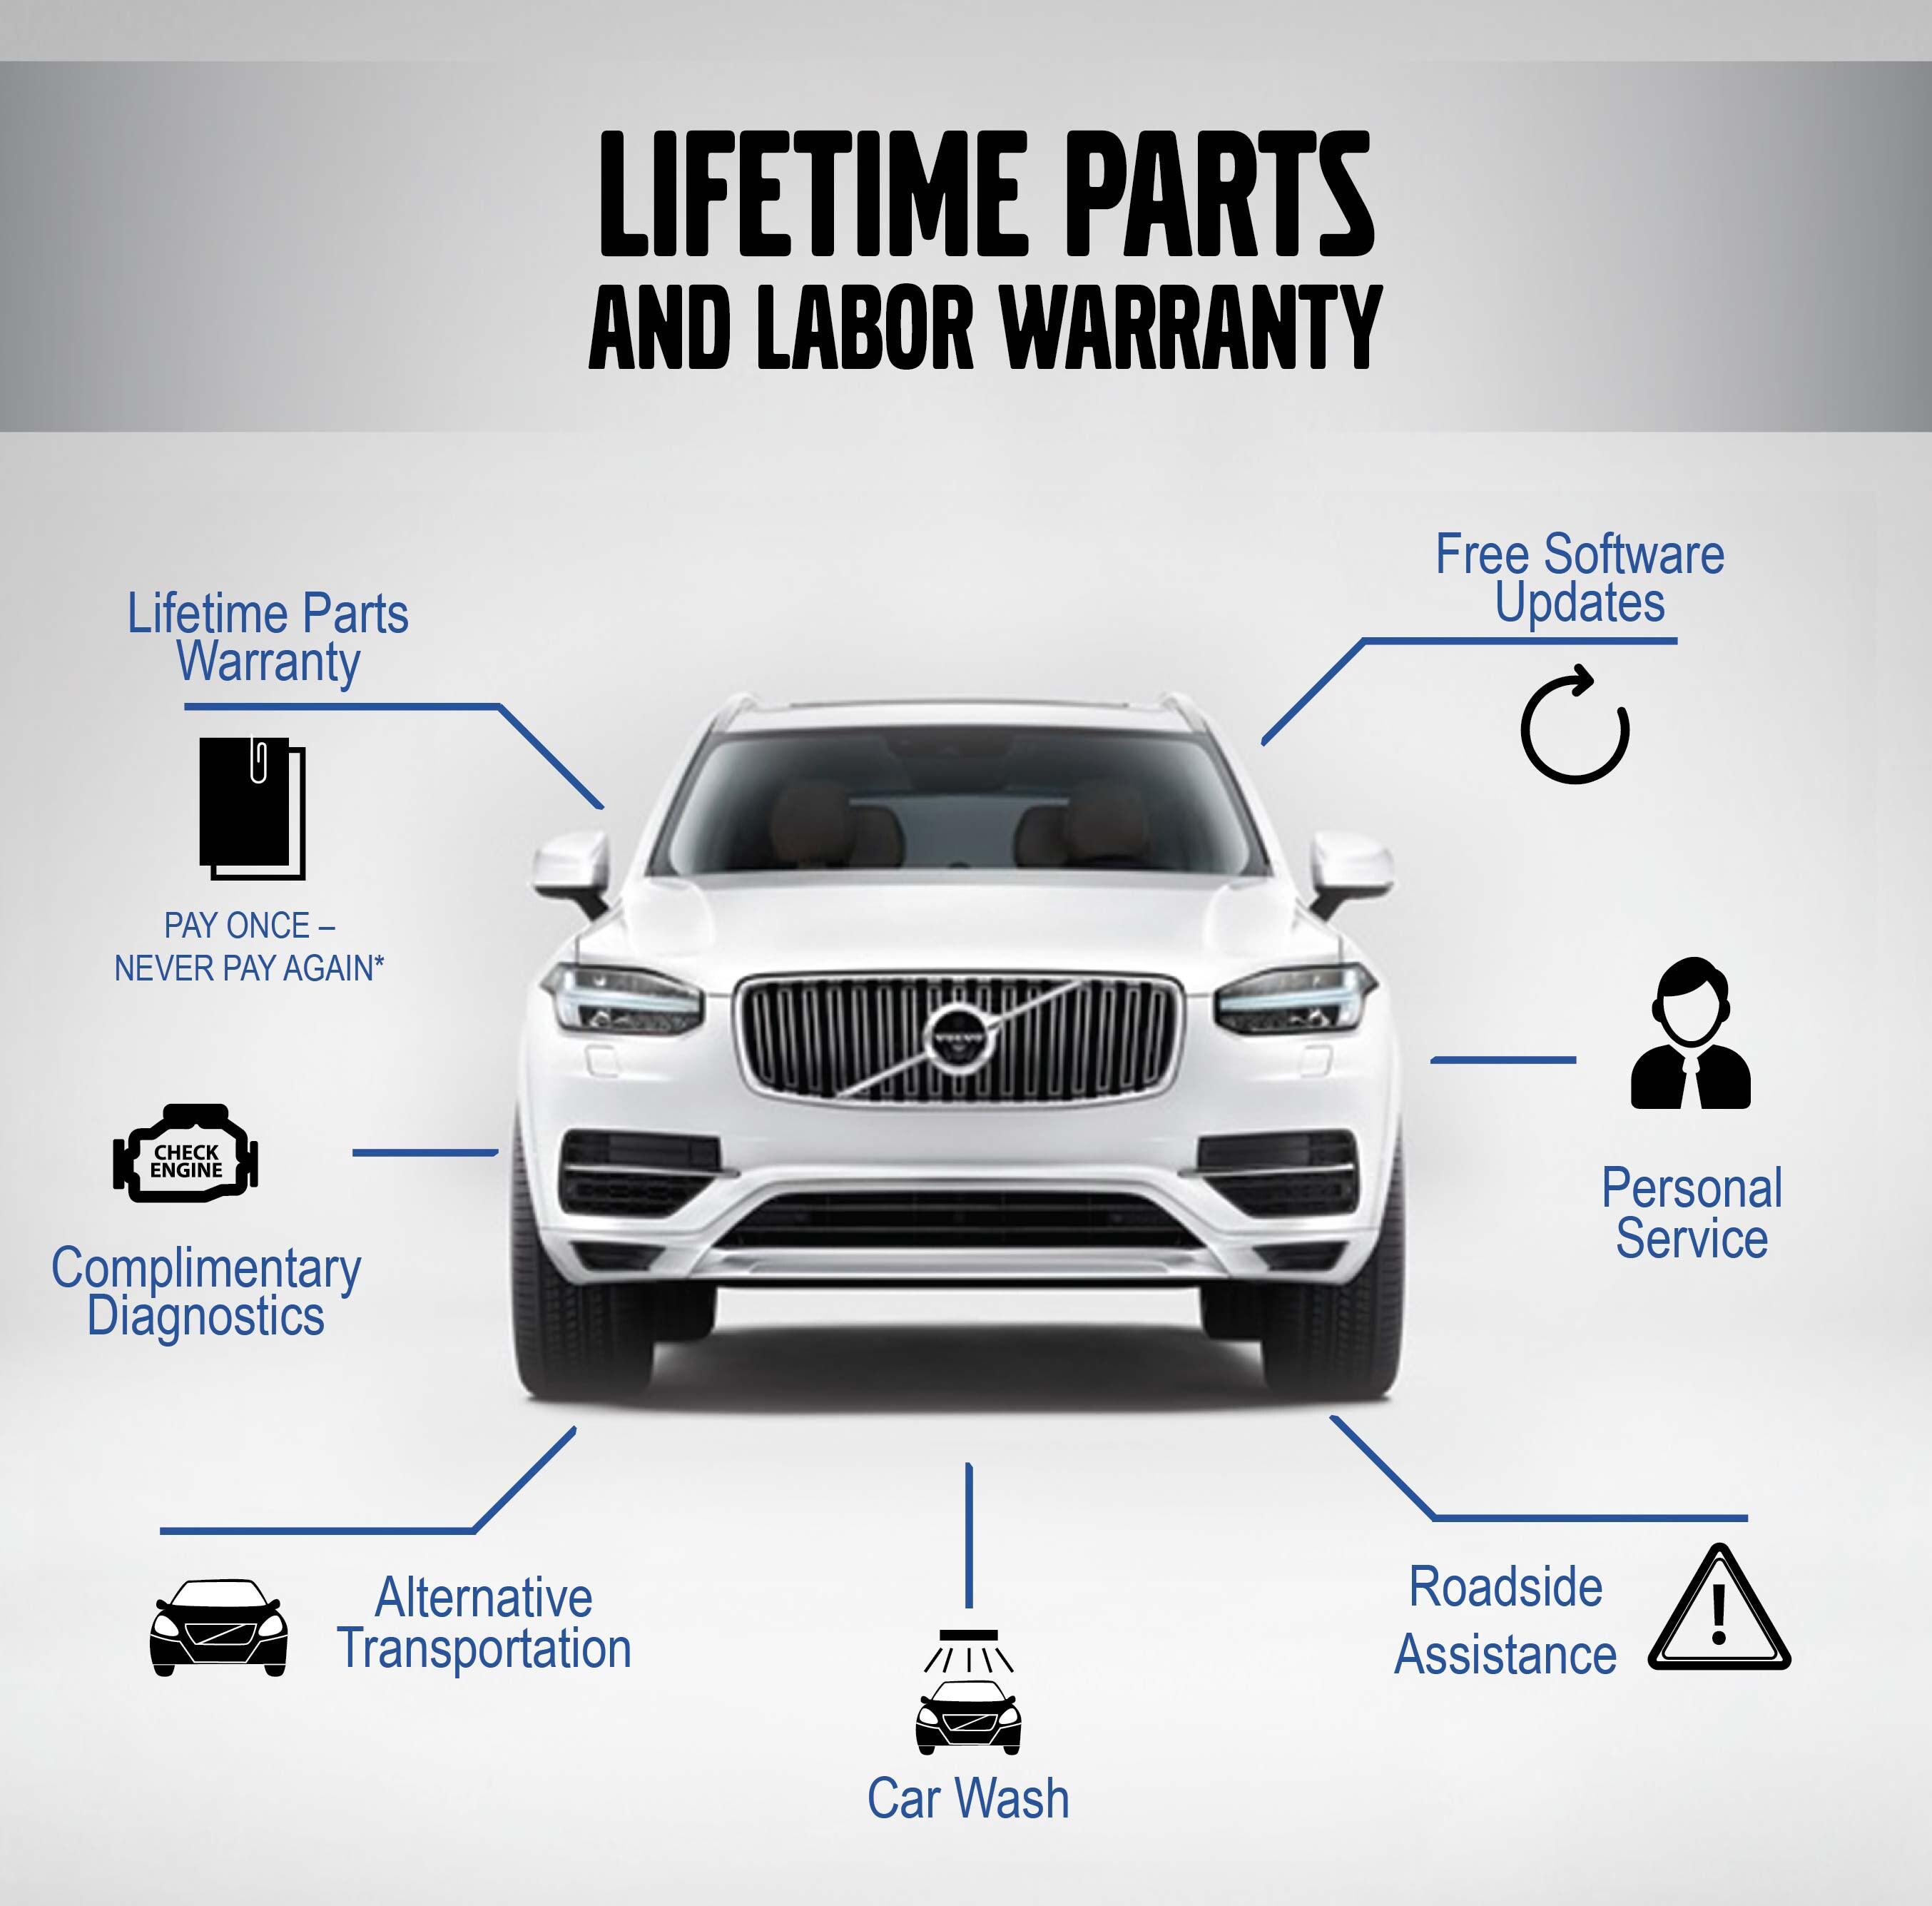 Volvo Repair Orlando: Albany Volvo Parts Specials, Discounts & Coupons At